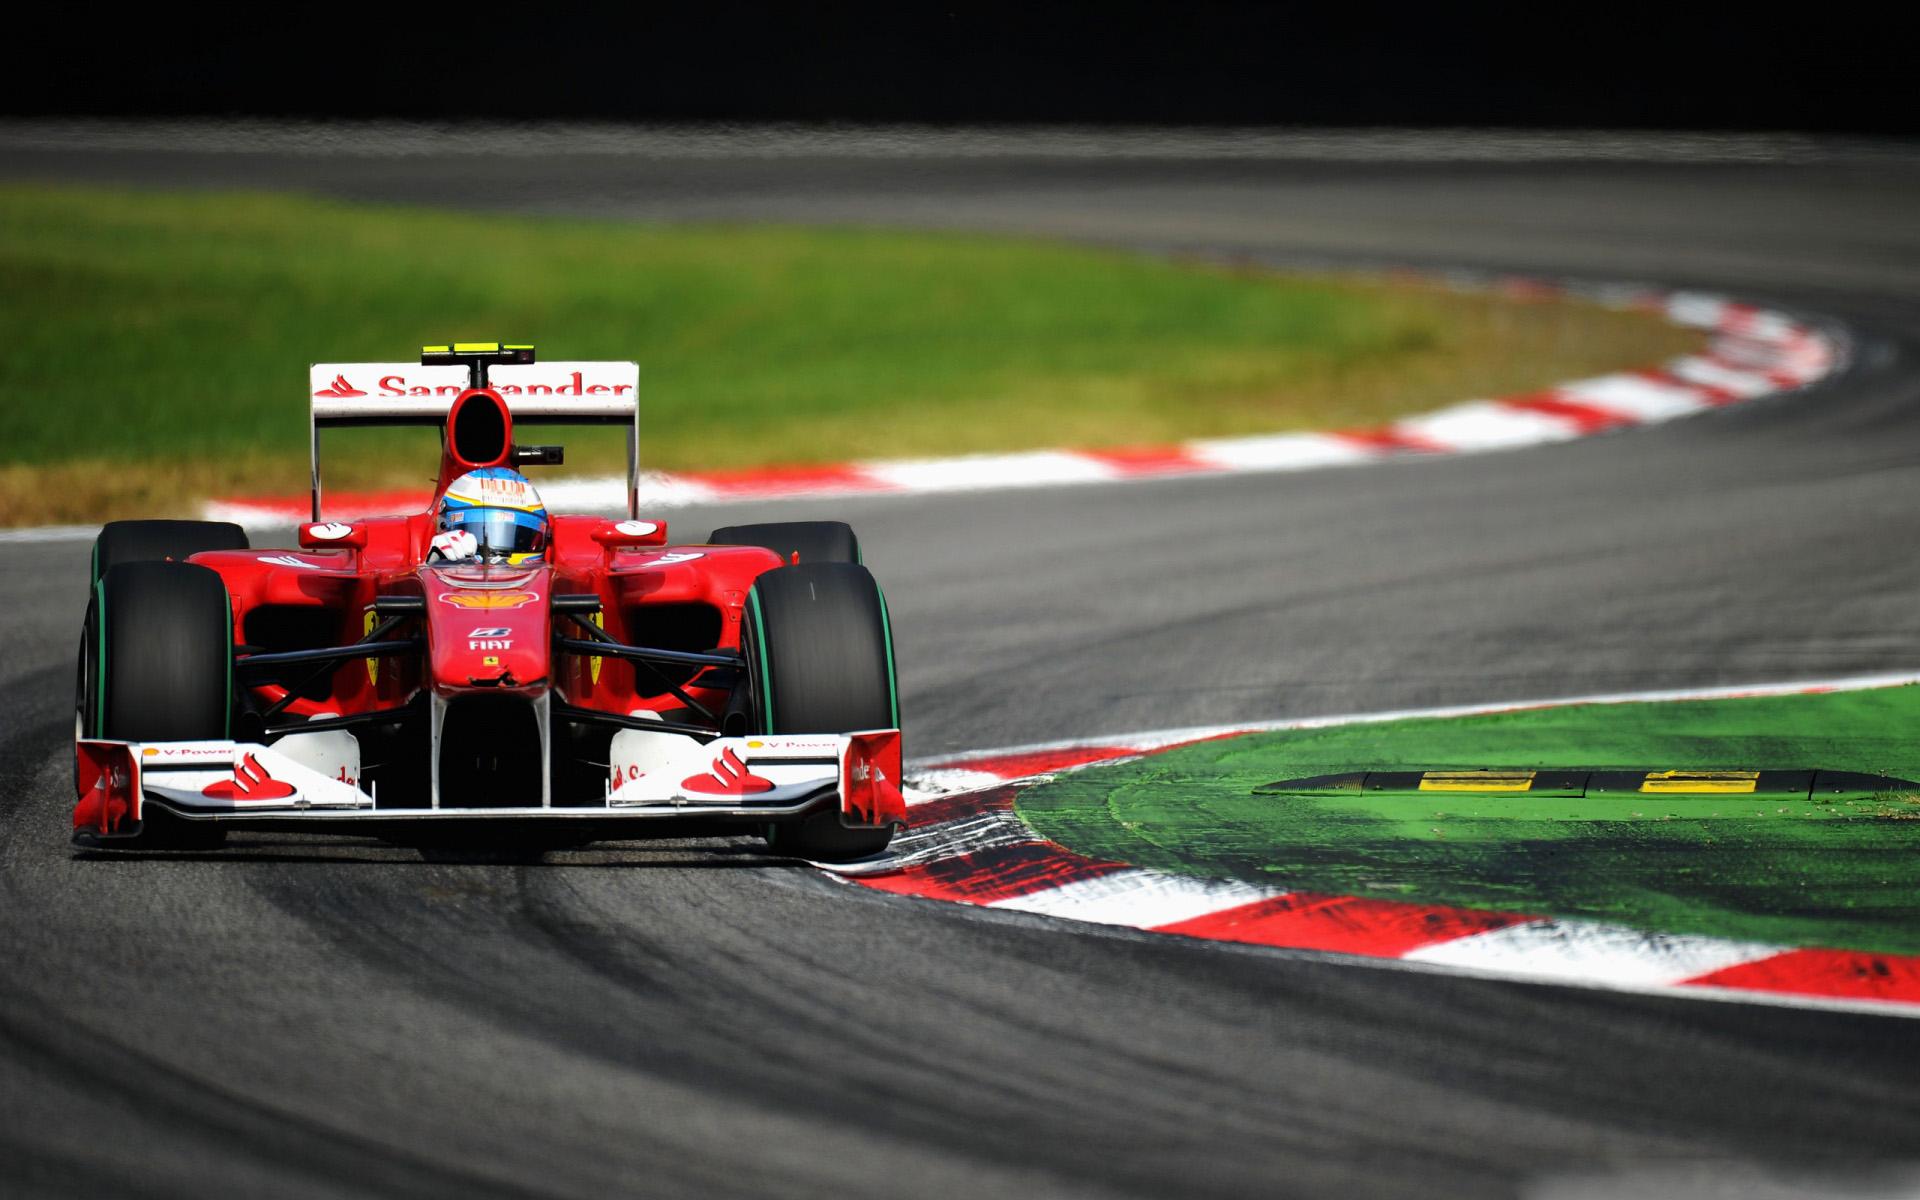 150530 picture. 150530 picture. 150530. Formula 1 HD Wallpaper picture background